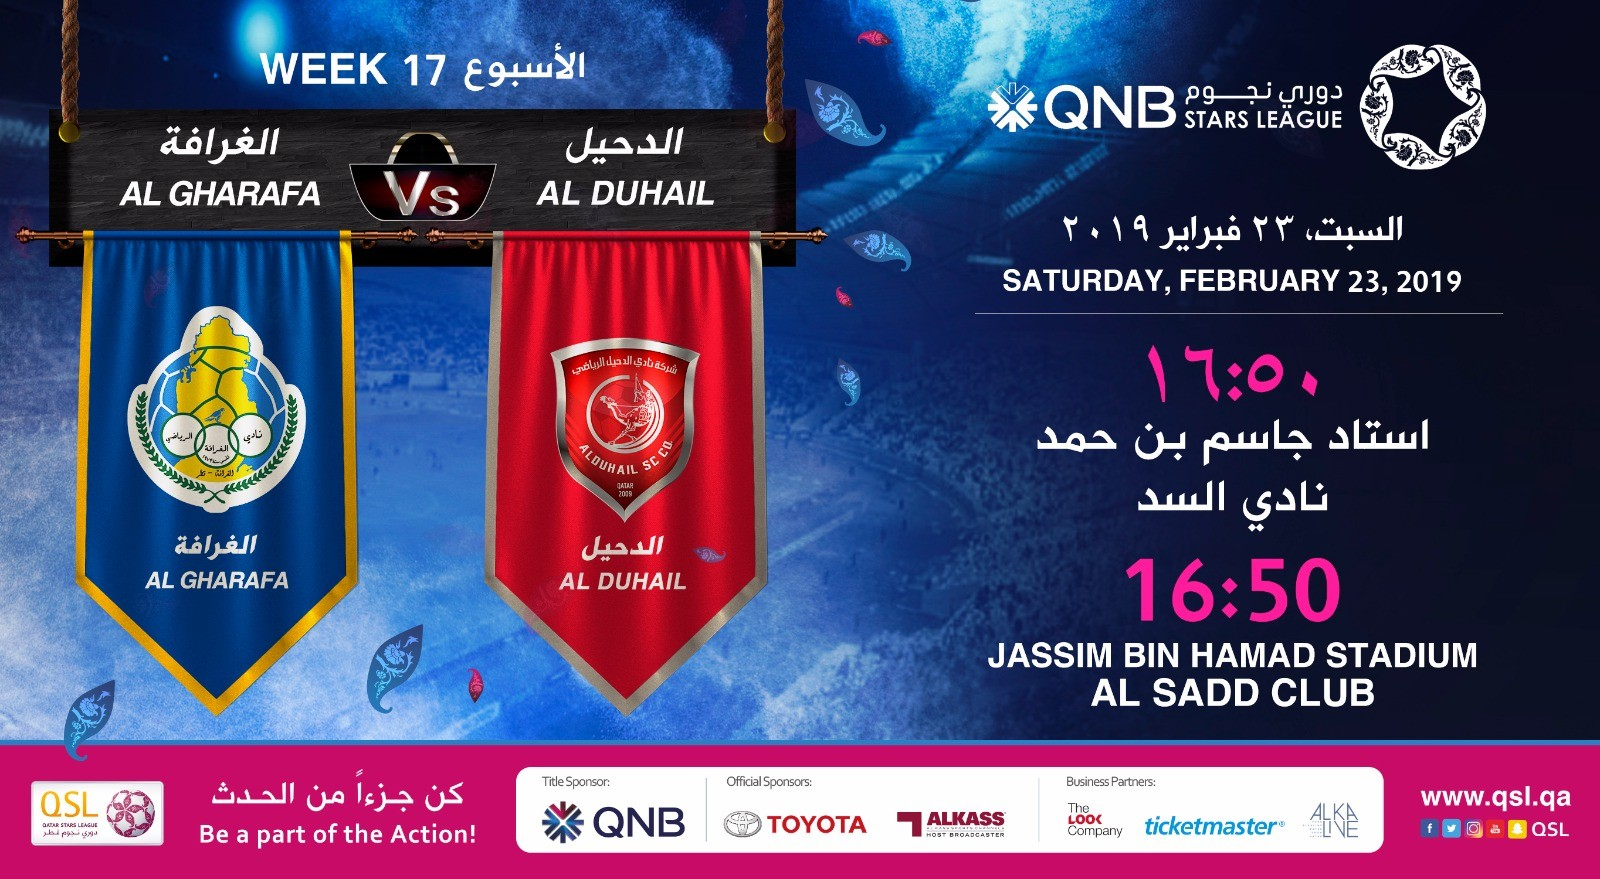 QNB Stars League Week 17 — Al Gharafa vs Al Duhail